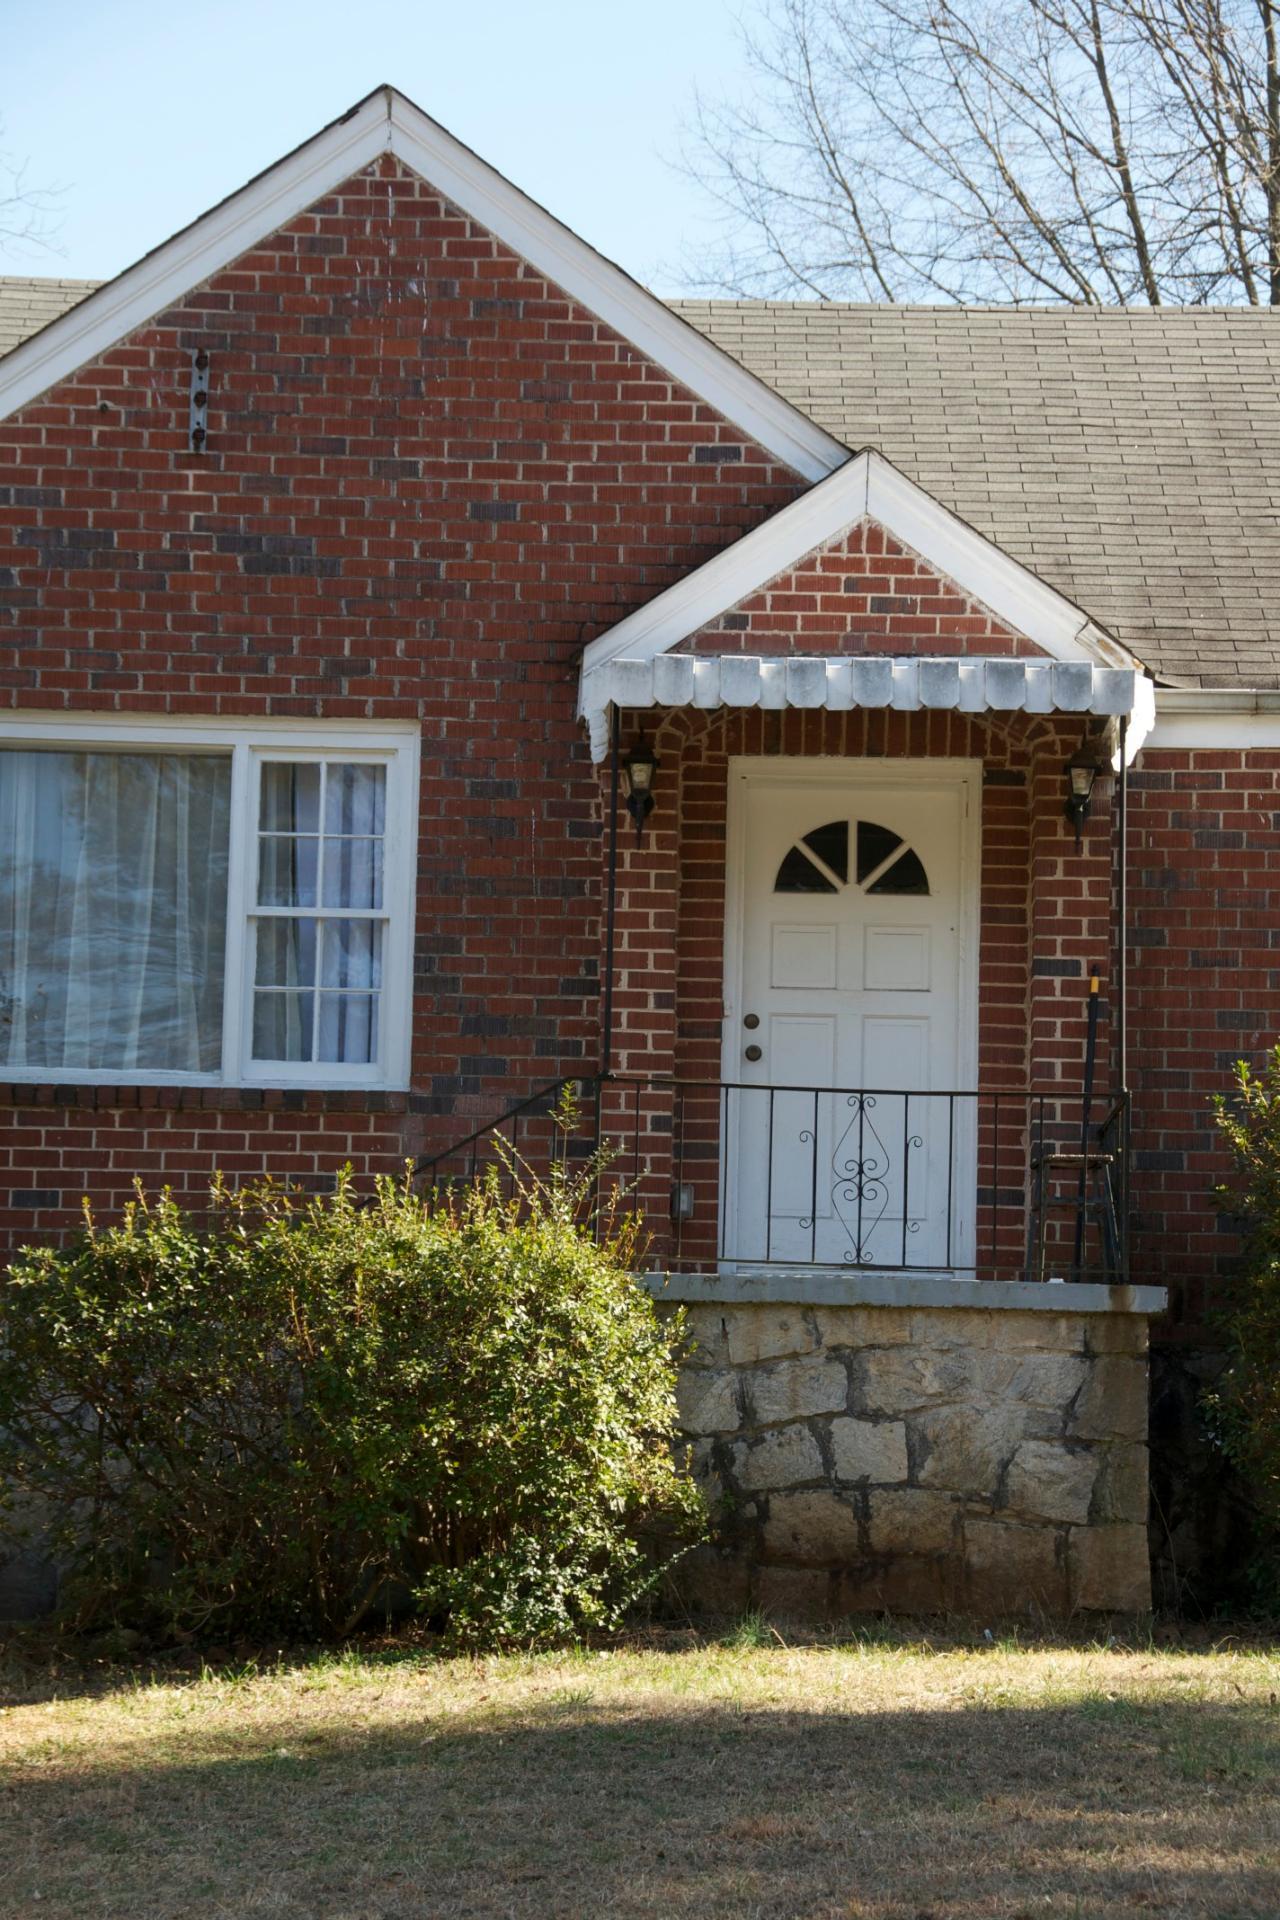 Idea Exterior Home Design: Curb Appeal Tips: Home Exterior